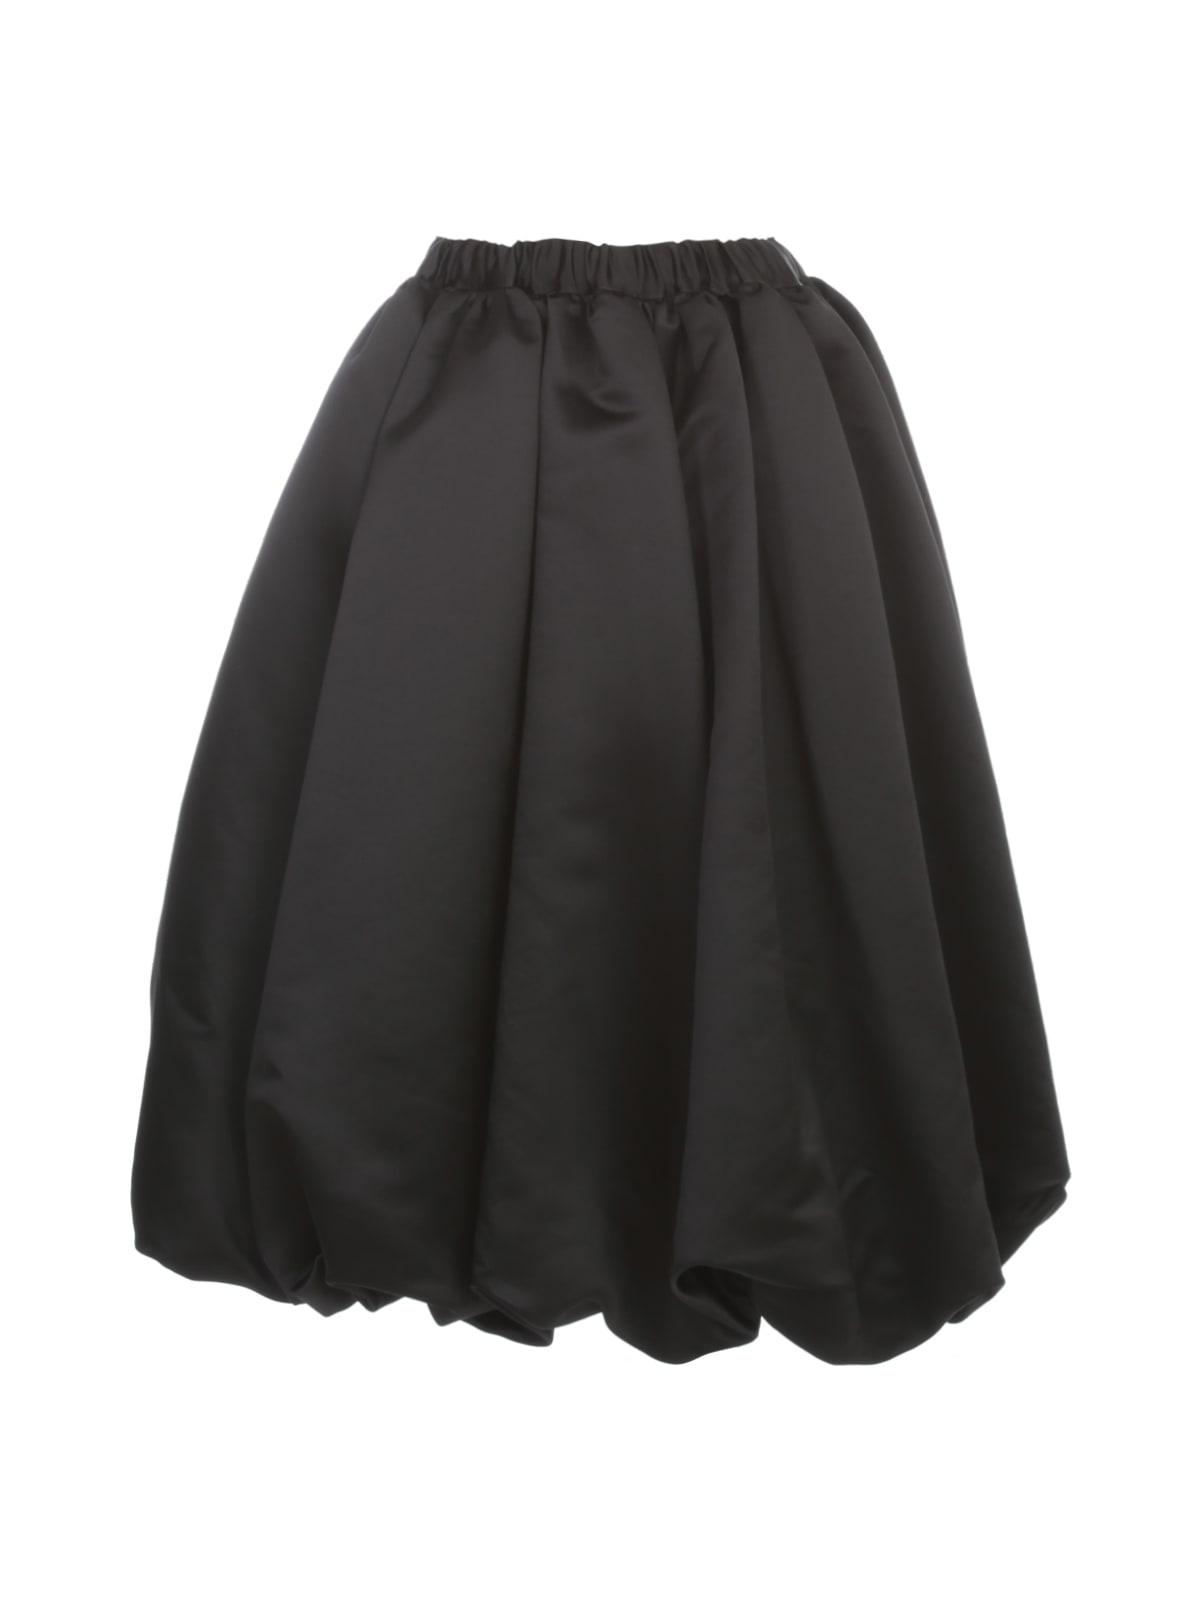 Comme des Garçons Thick Polyester Satin Balloon Skirt Elastic Waist